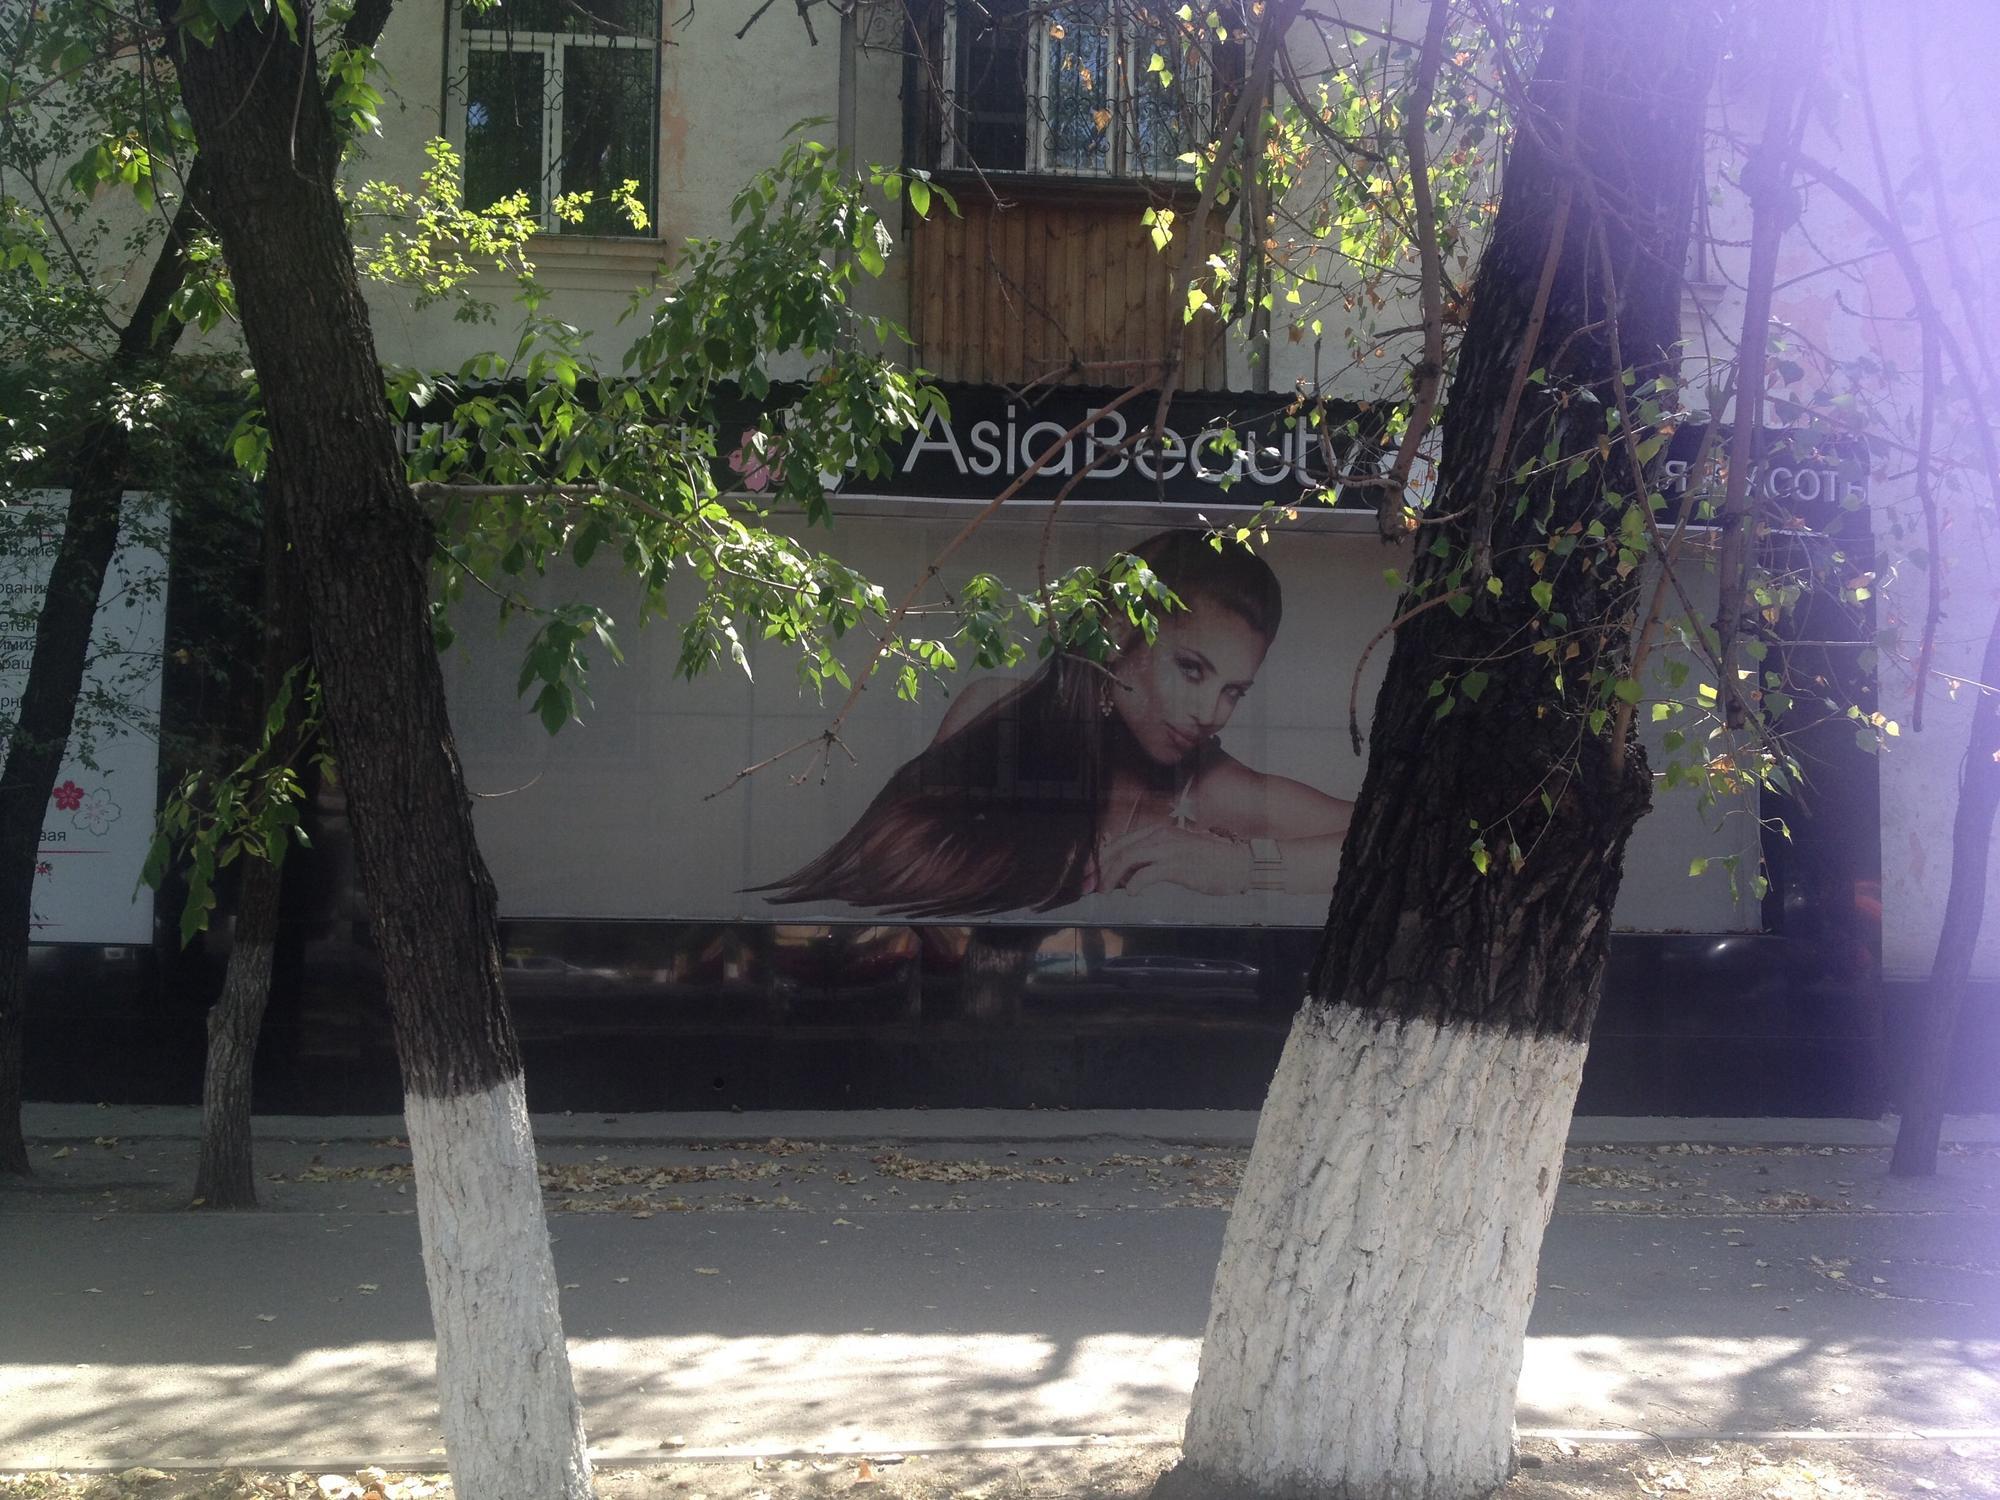 фотография Салона красоты Asia beauty в Алмалинском районе